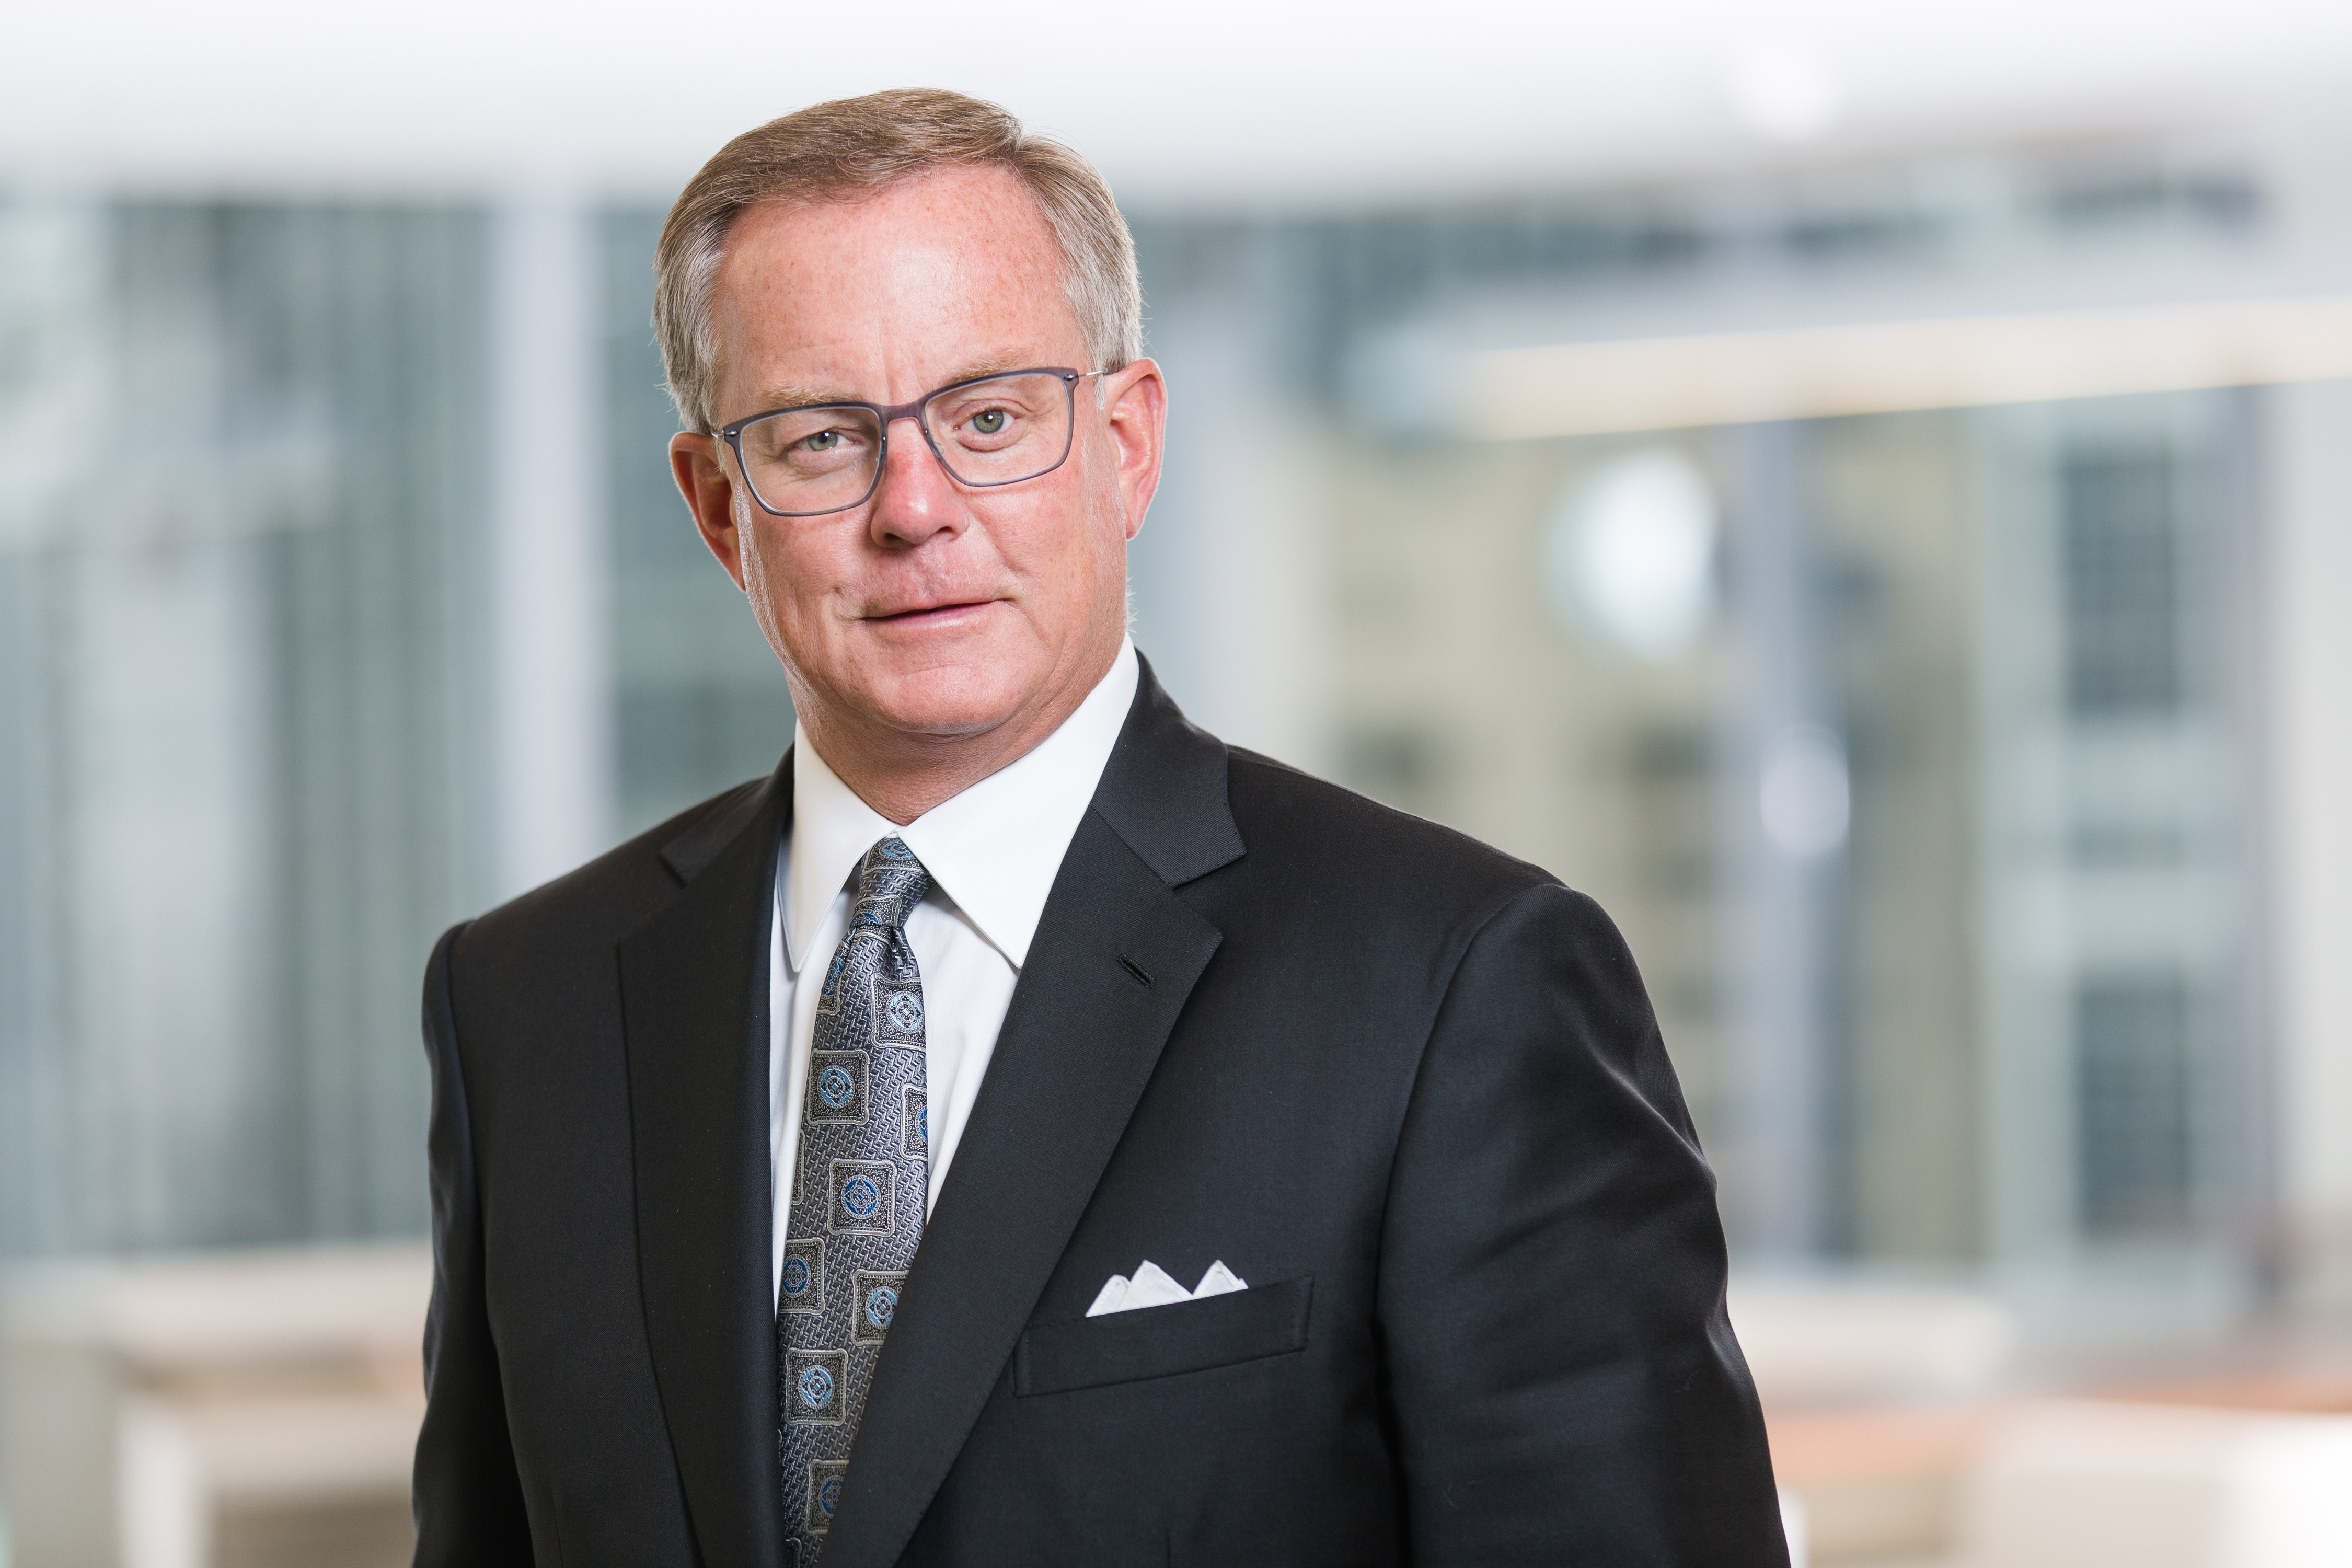 Dentsply Sirona Announces Leadership Changes